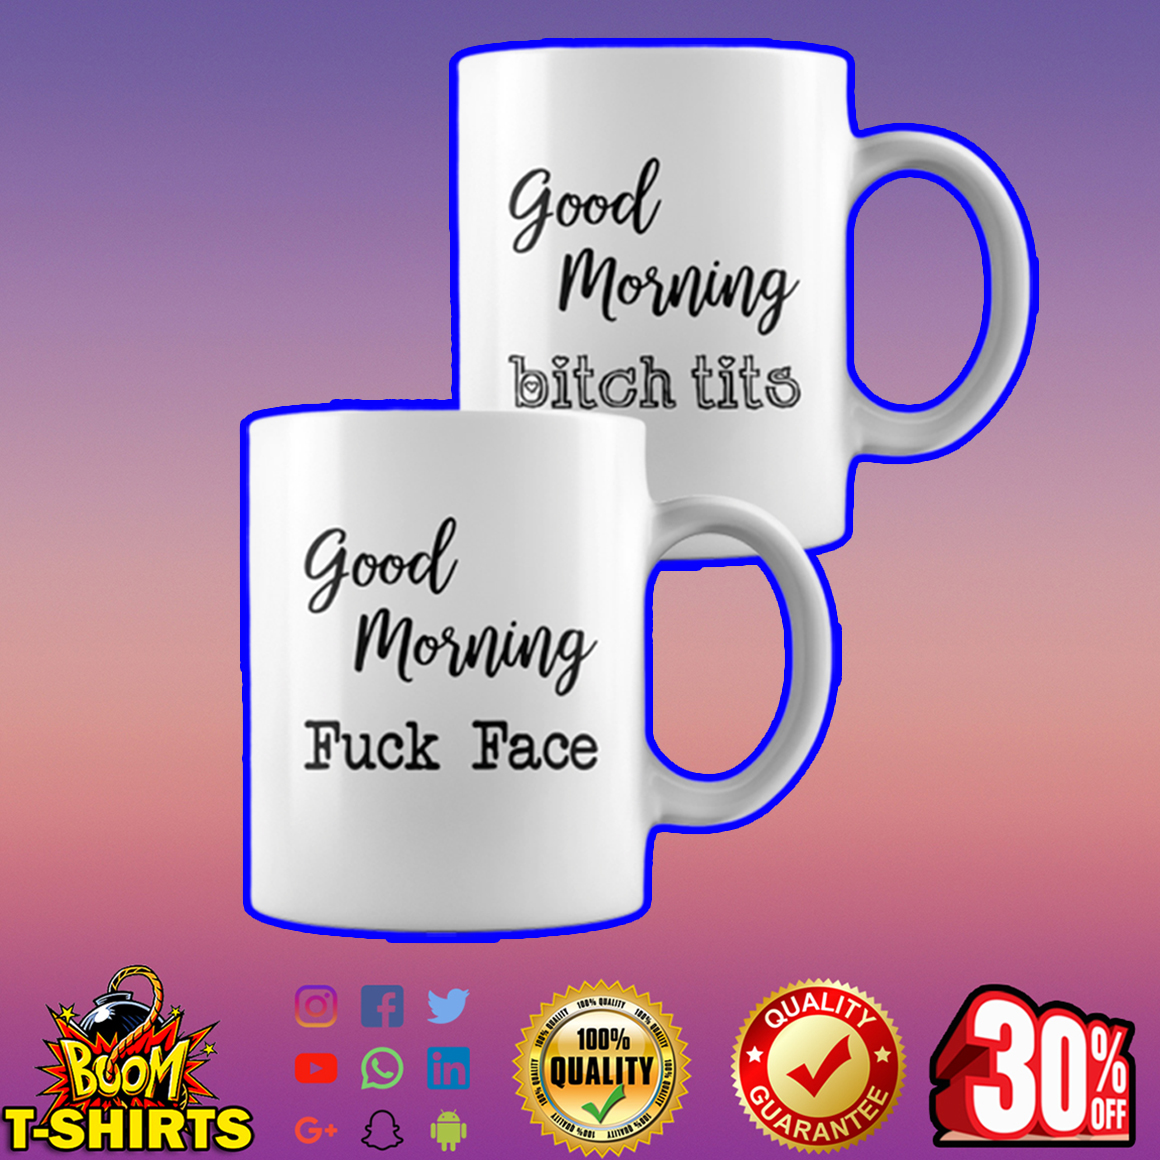 Good morning fuck face - Good morning bitch tits white mug